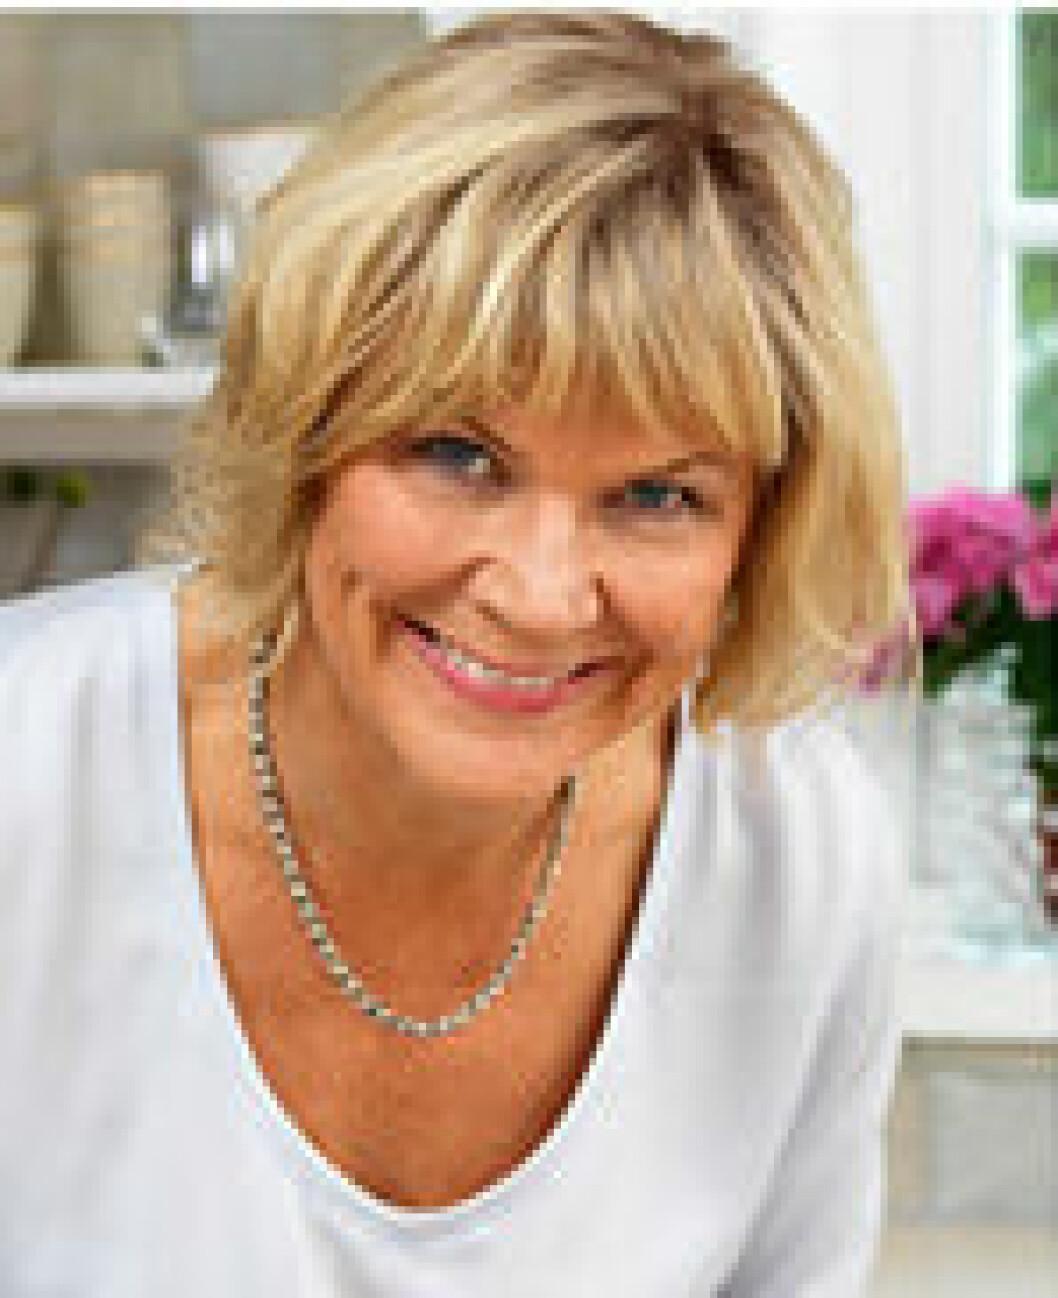 Matmagasinets chefredaktör Maud Onnermark